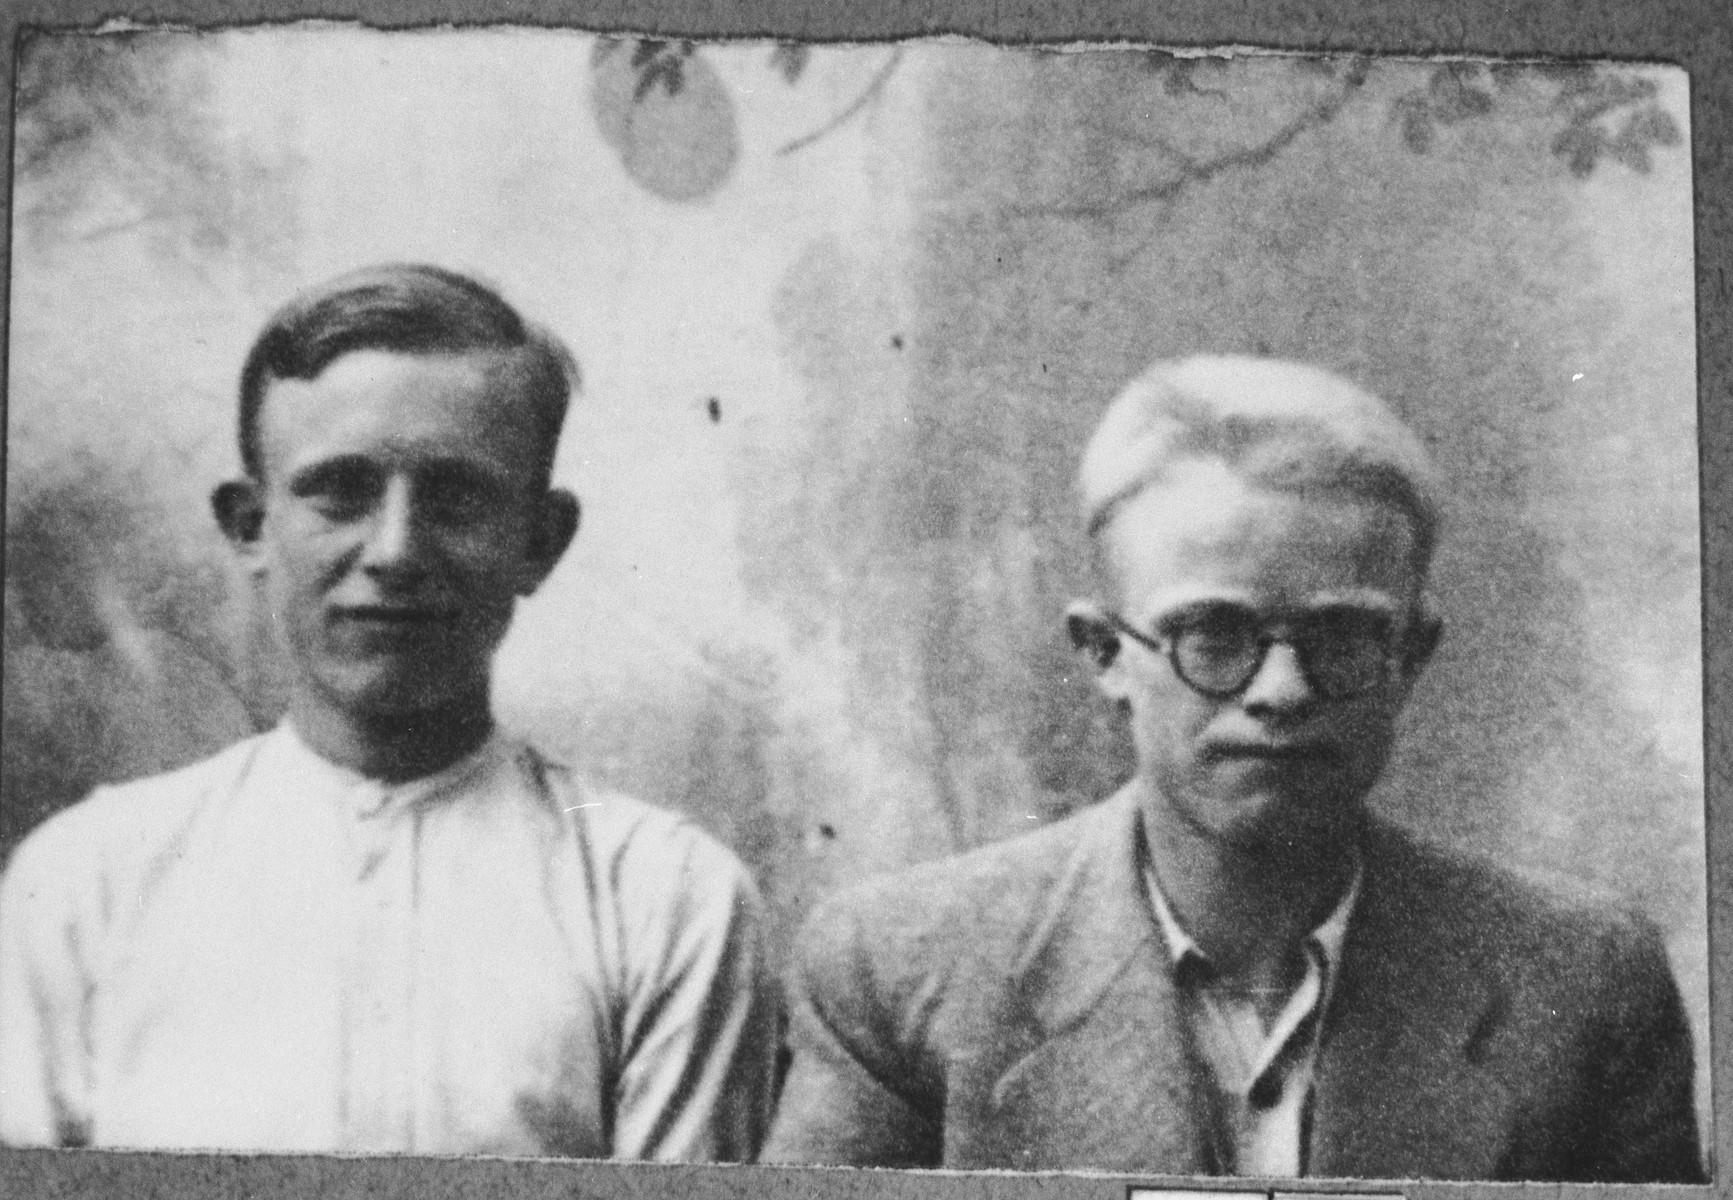 Portrait of Solomon and Avram Kassorla, sons of Rachamin Kassorla.  They were students.  They lived at Zmayeva 6 in Bitola.